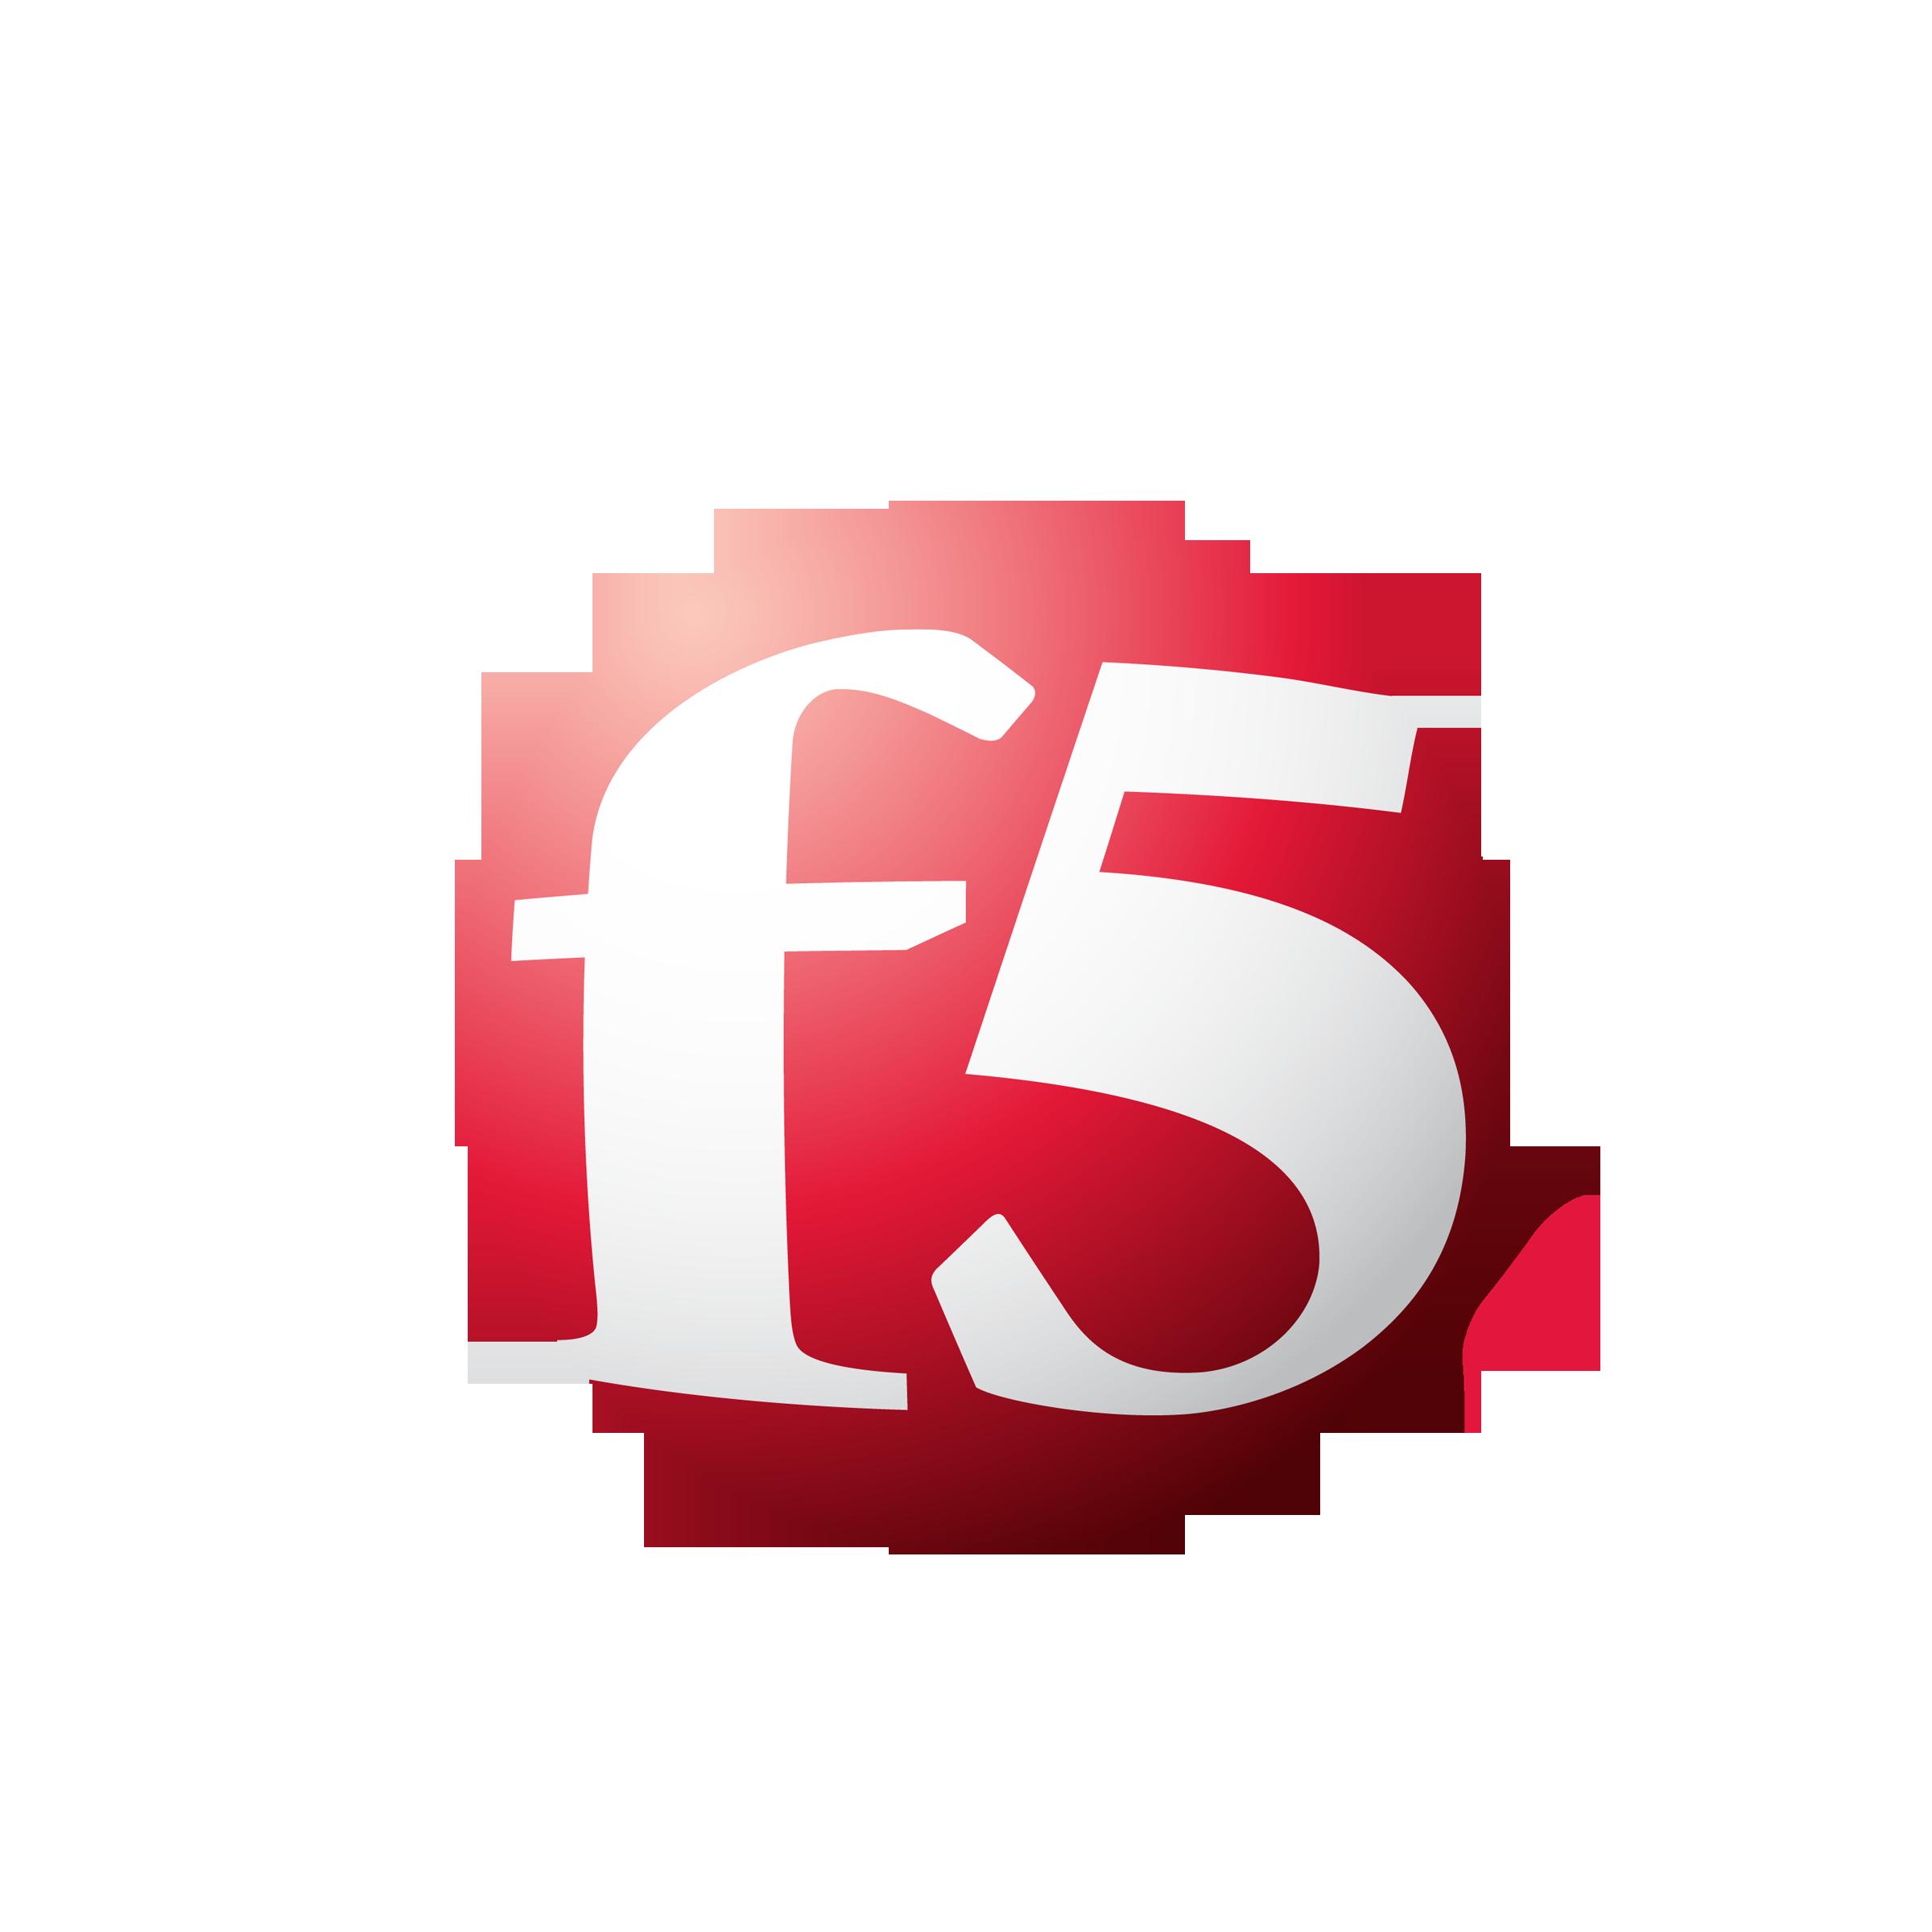 33f5_networks-logo